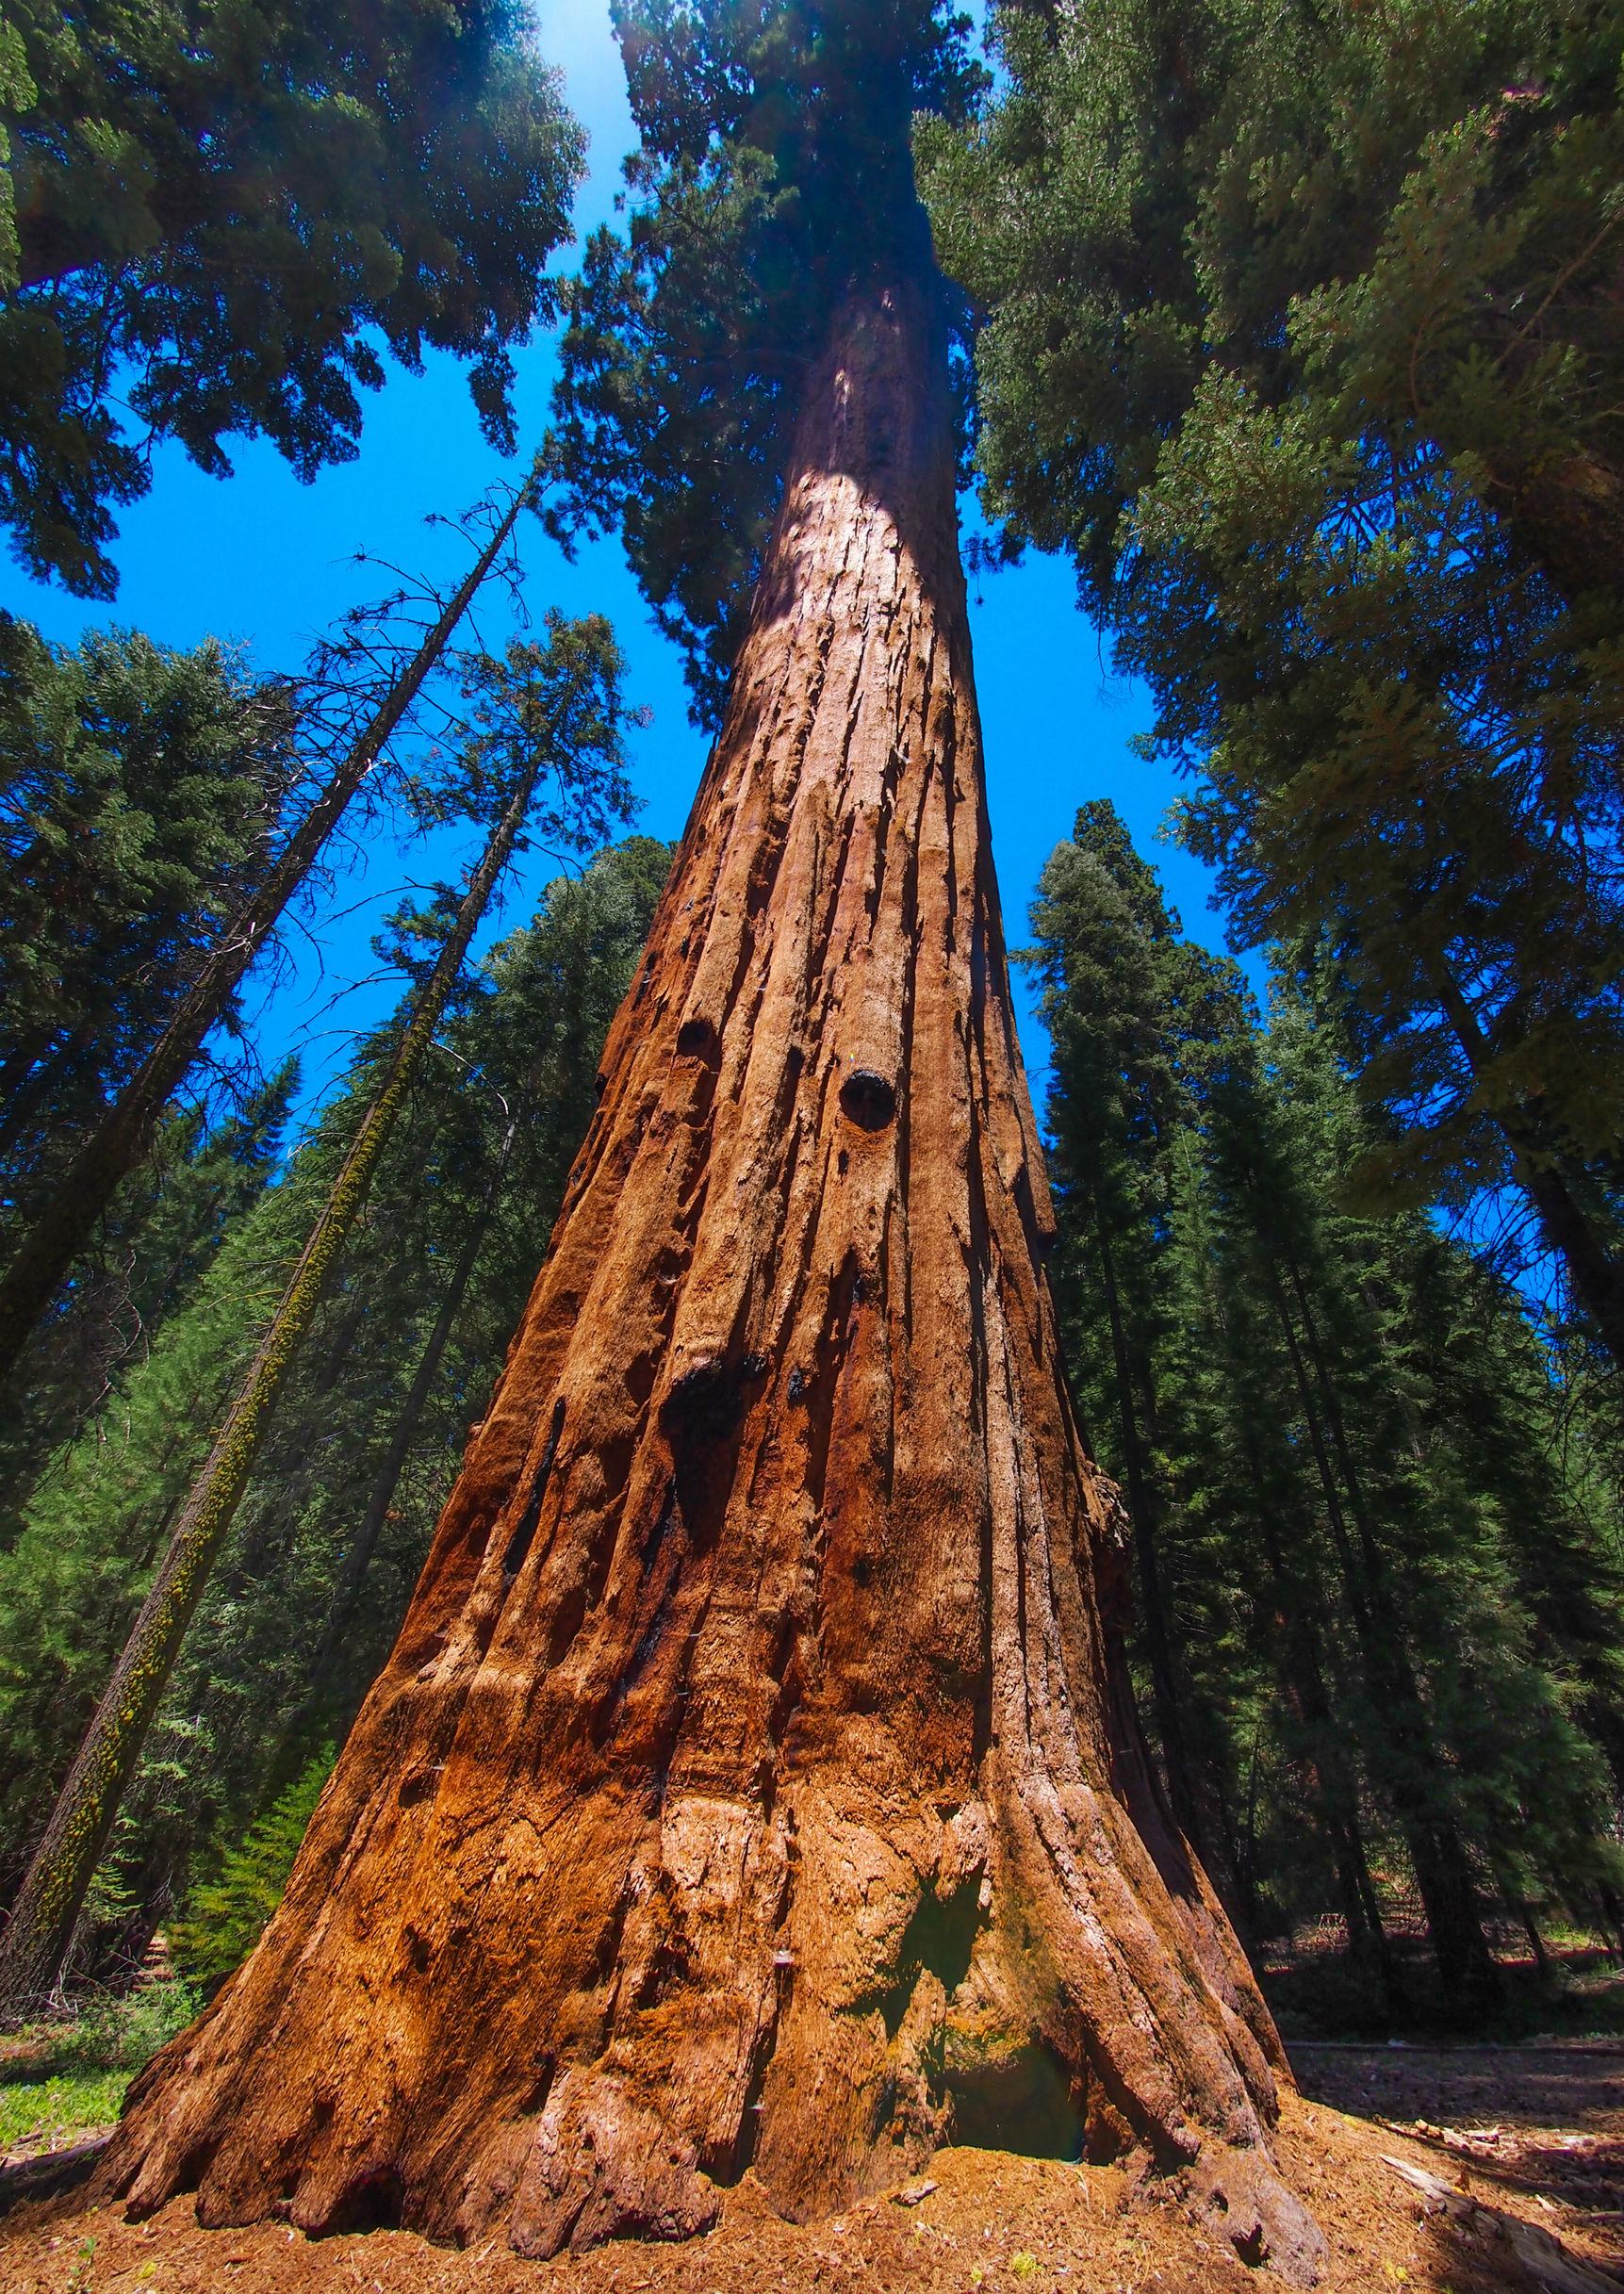 Best 54 Sequoia National Park Wallpaper on HipWallpaper 1723x2434